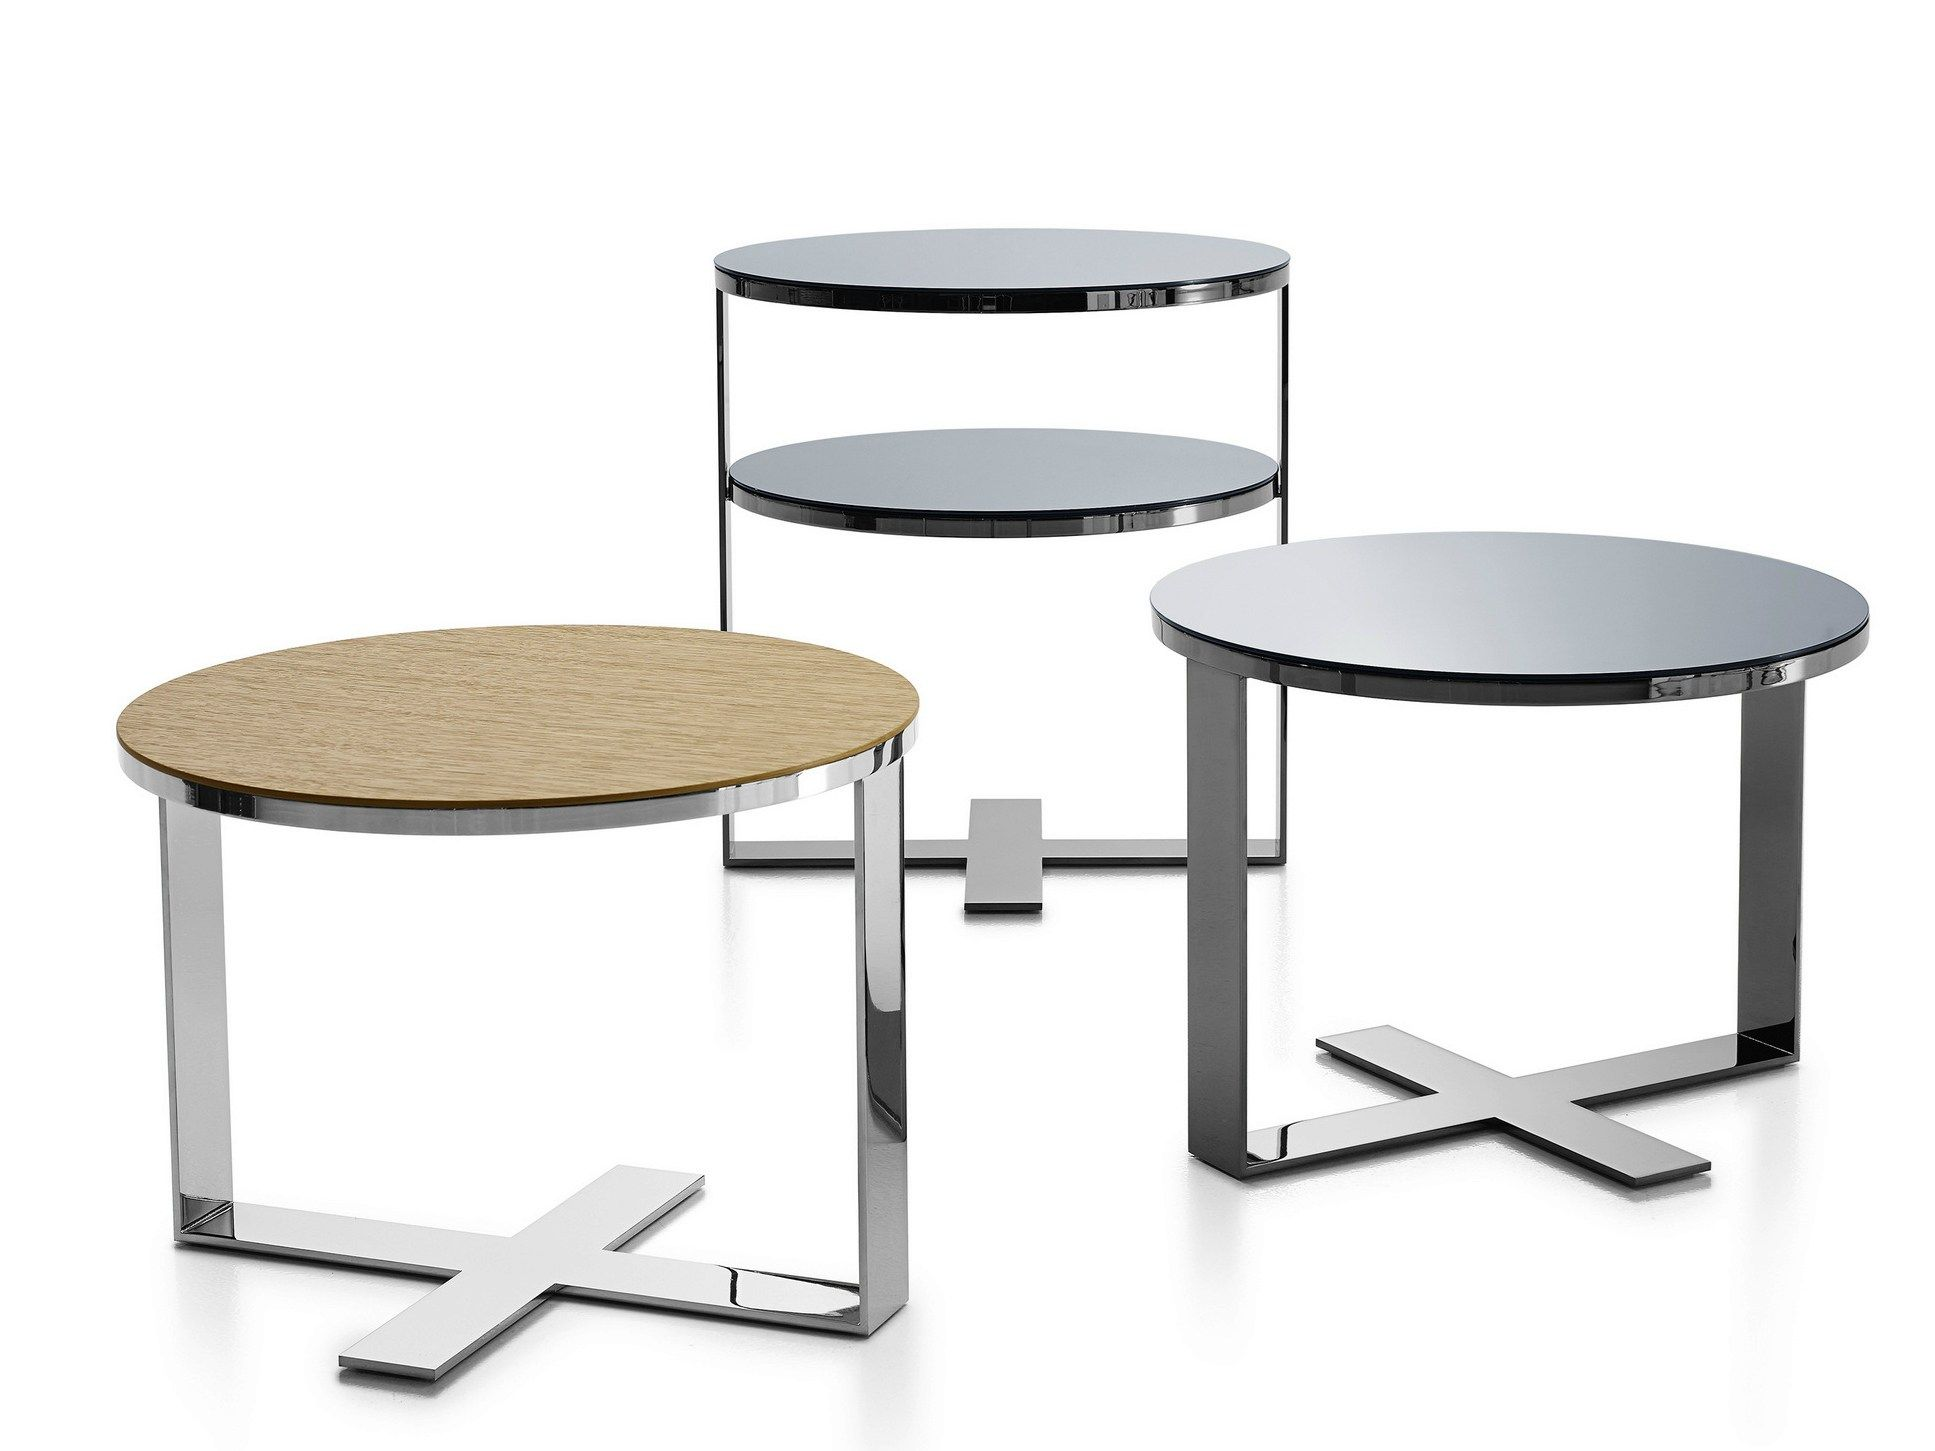 Eileen Coffee Table By B B Italia Design Antonio Citterio B B Italia Small Tables Coffee Table [ 1451 x 1935 Pixel ]